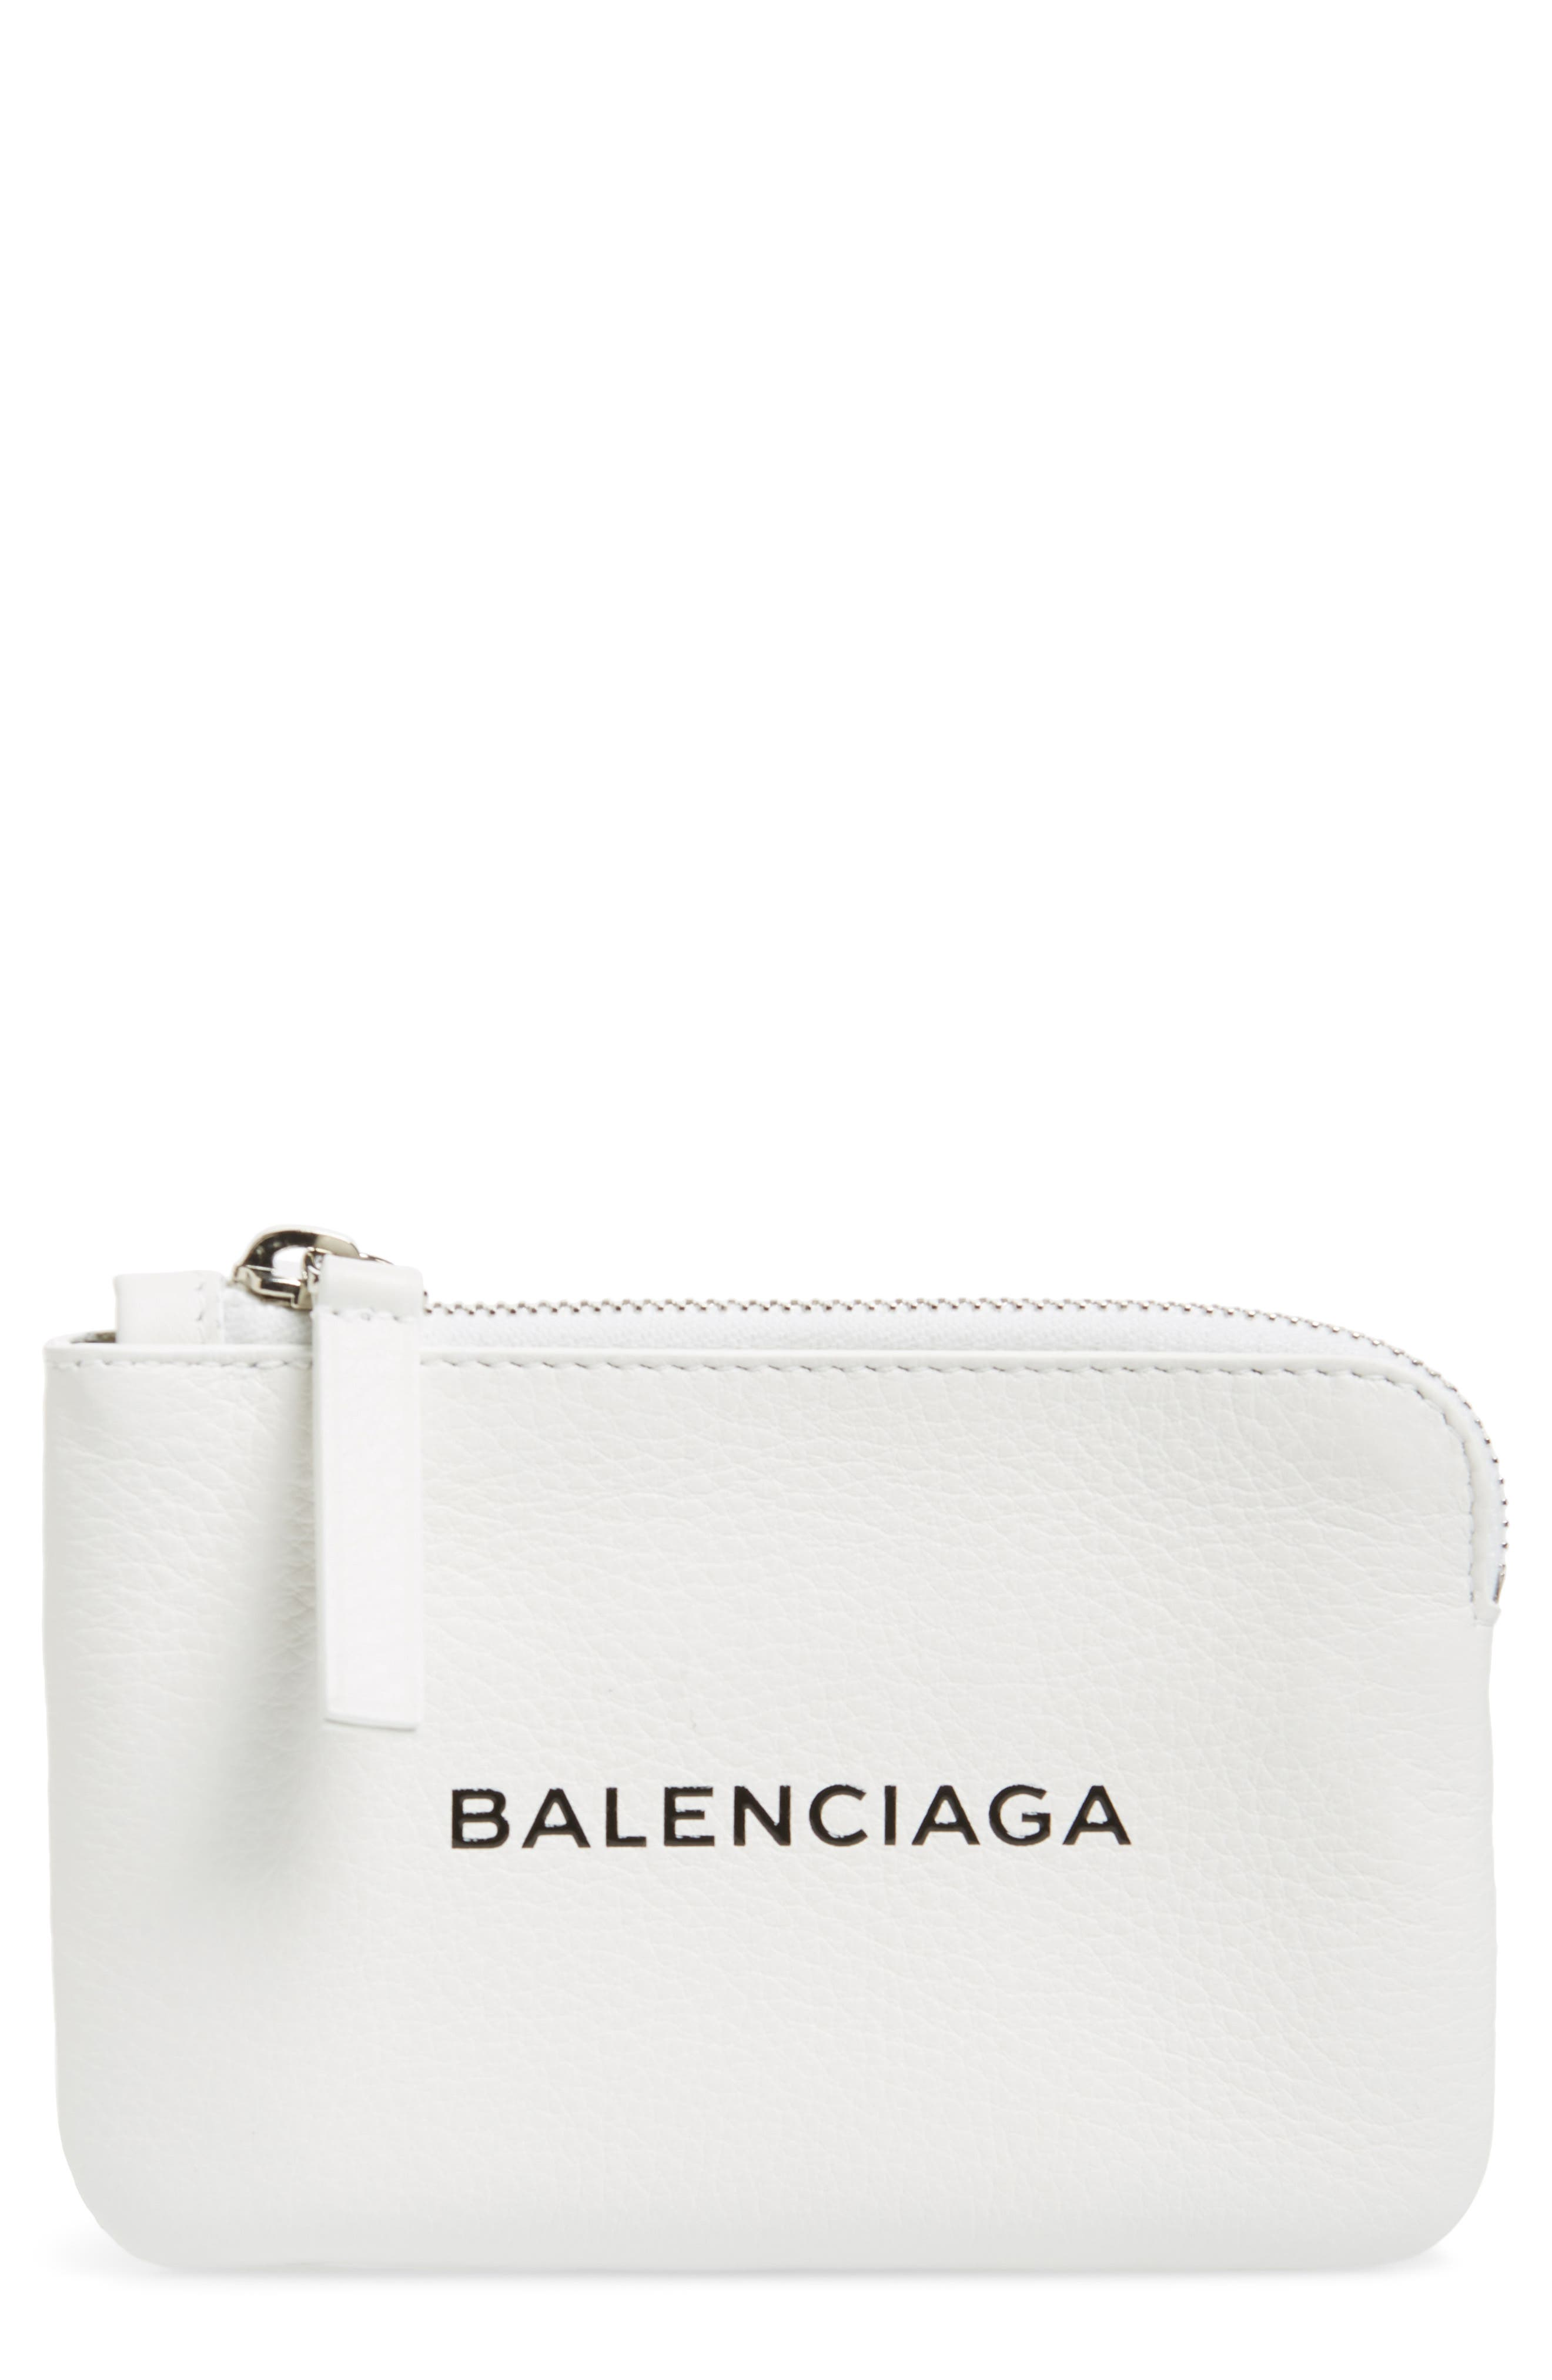 BALENCIAGA Everyday Leather Pouch, Main, color, BLANC OPTIQUE/ NOIR